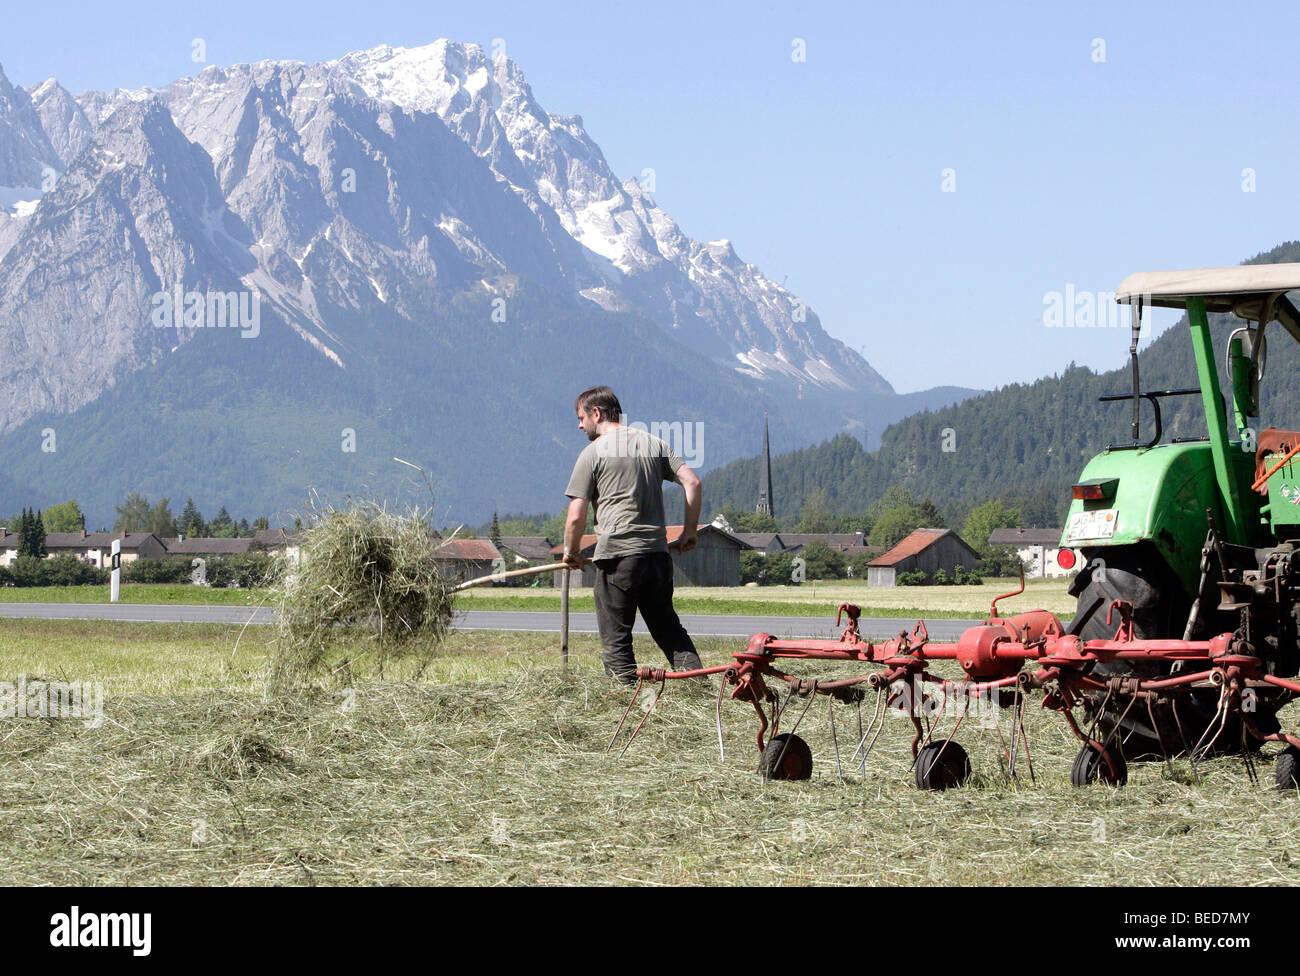 Farmer turning the hay on a field by hand, in front of the Wetterstein Range with Mt Zugspitze, near Garmisch-Partenkirchen, Stock Photo